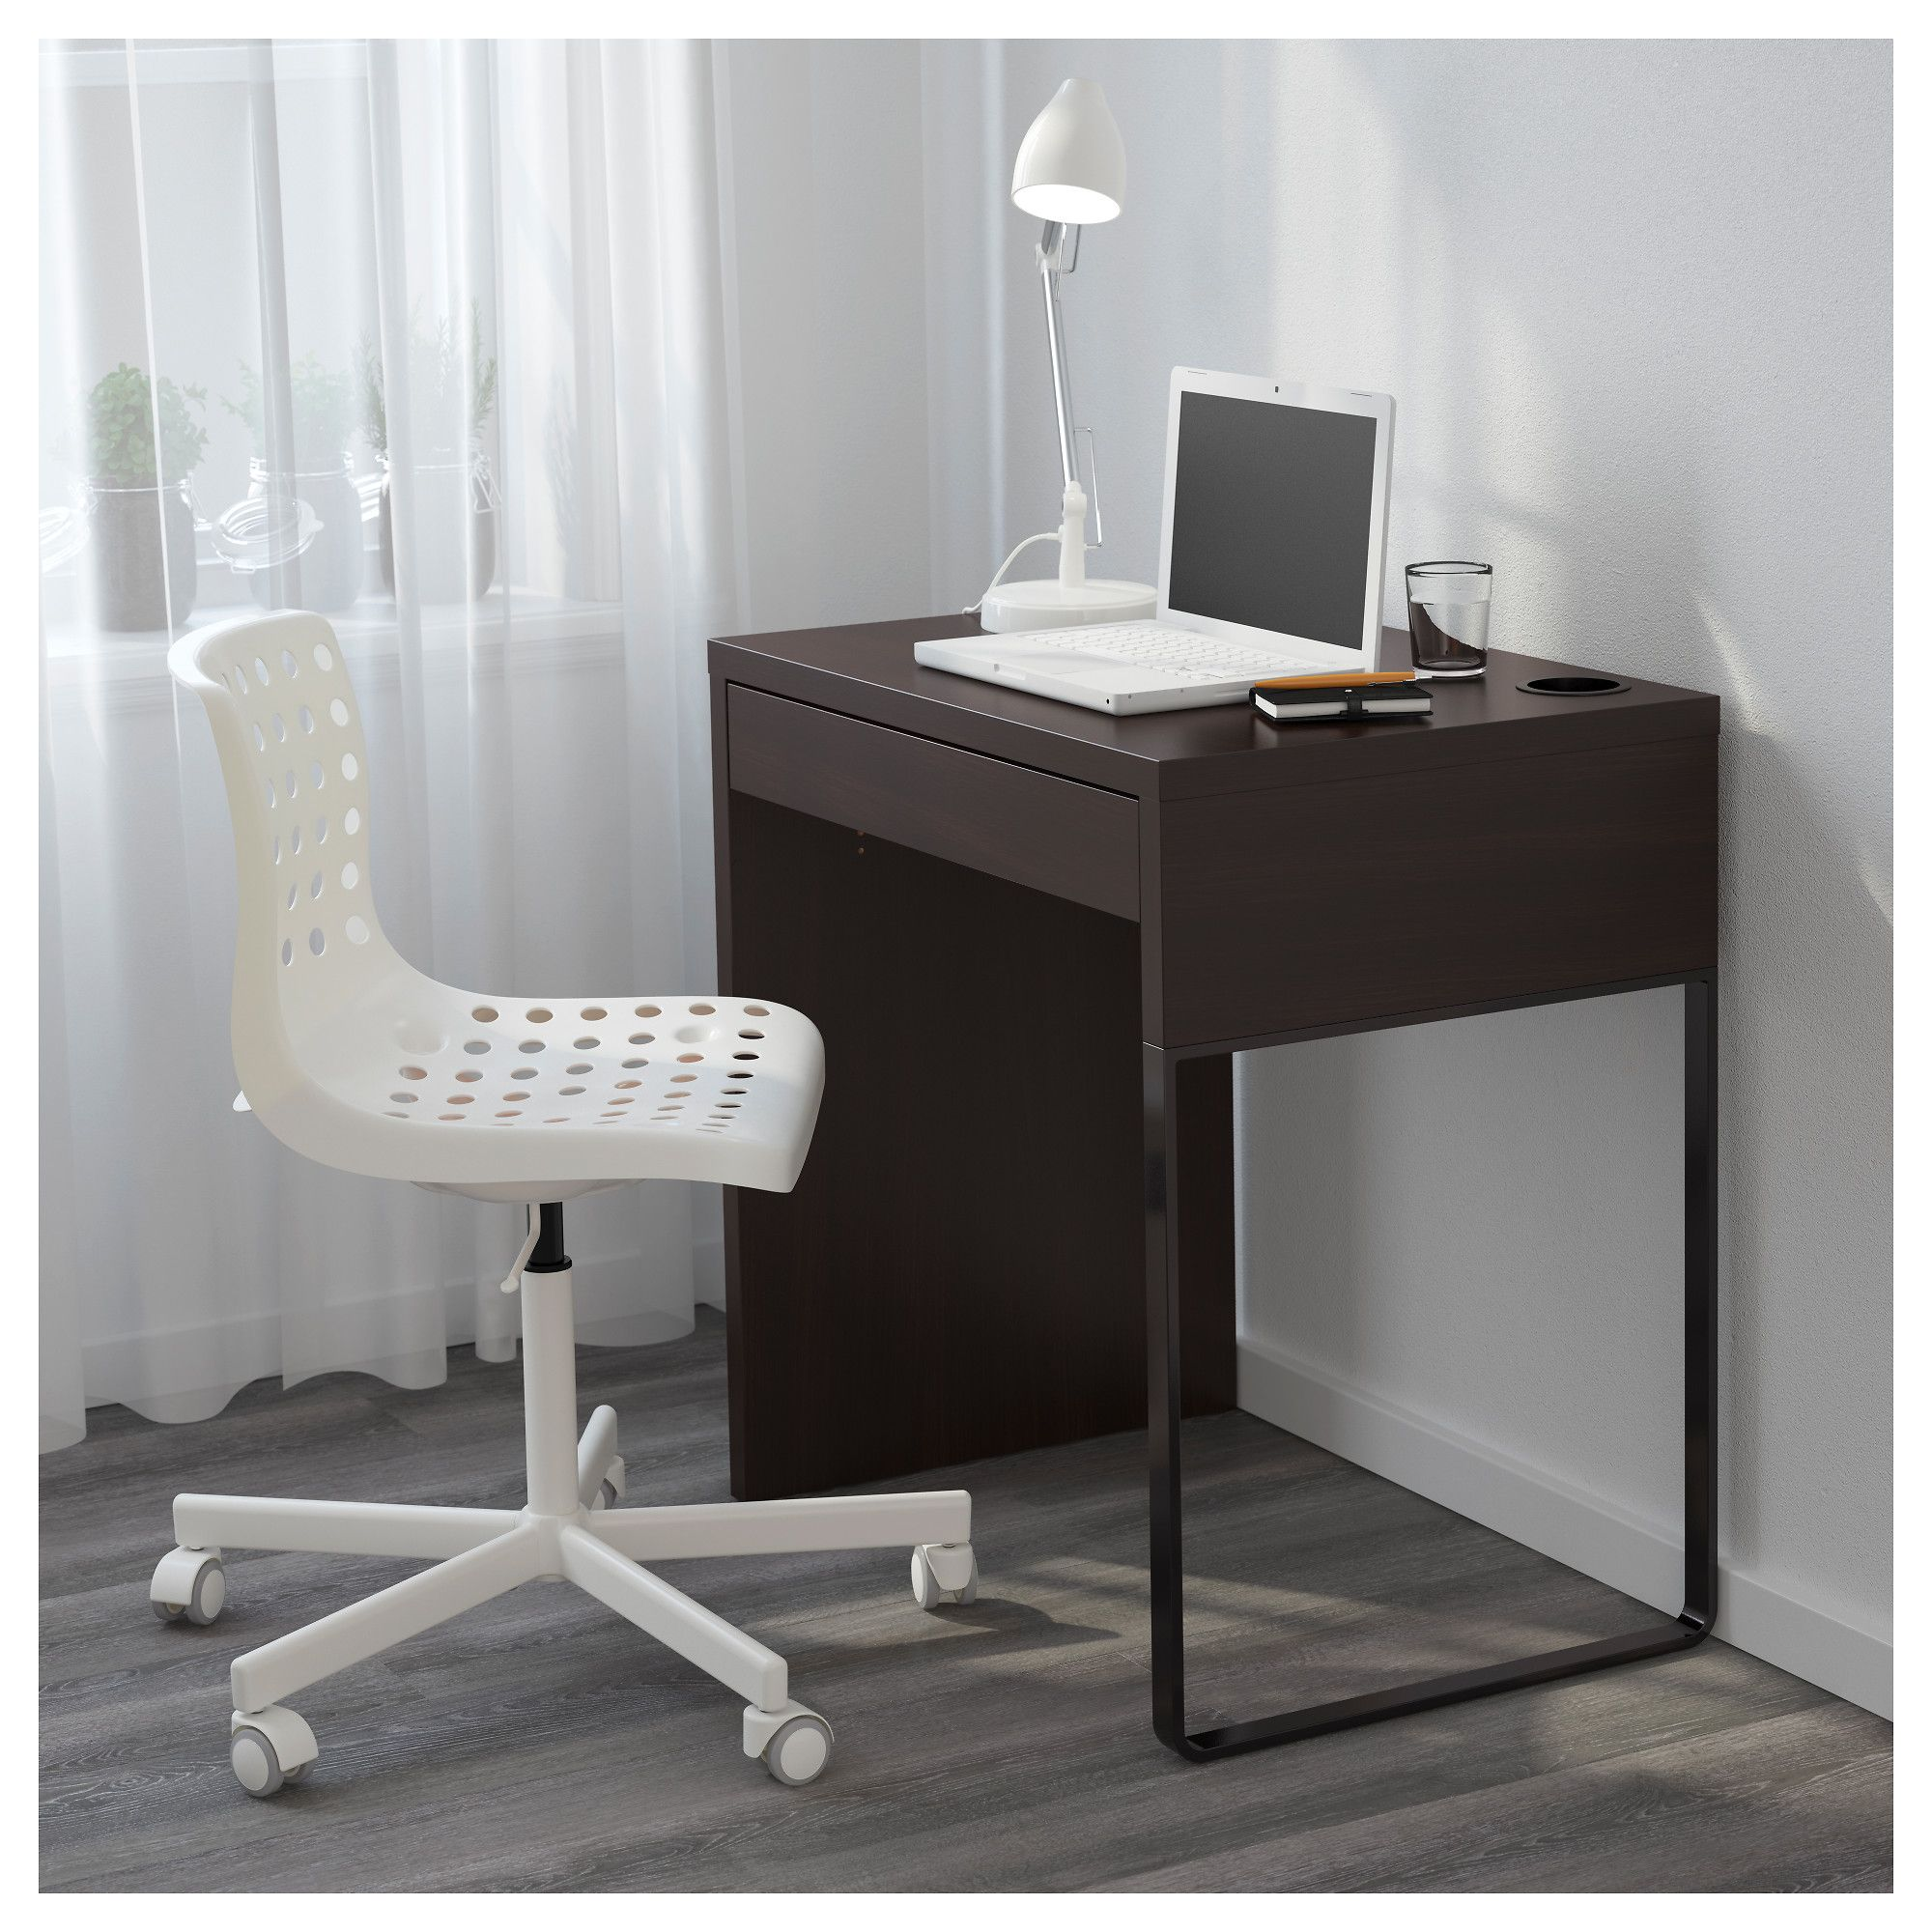 Compact Work desk